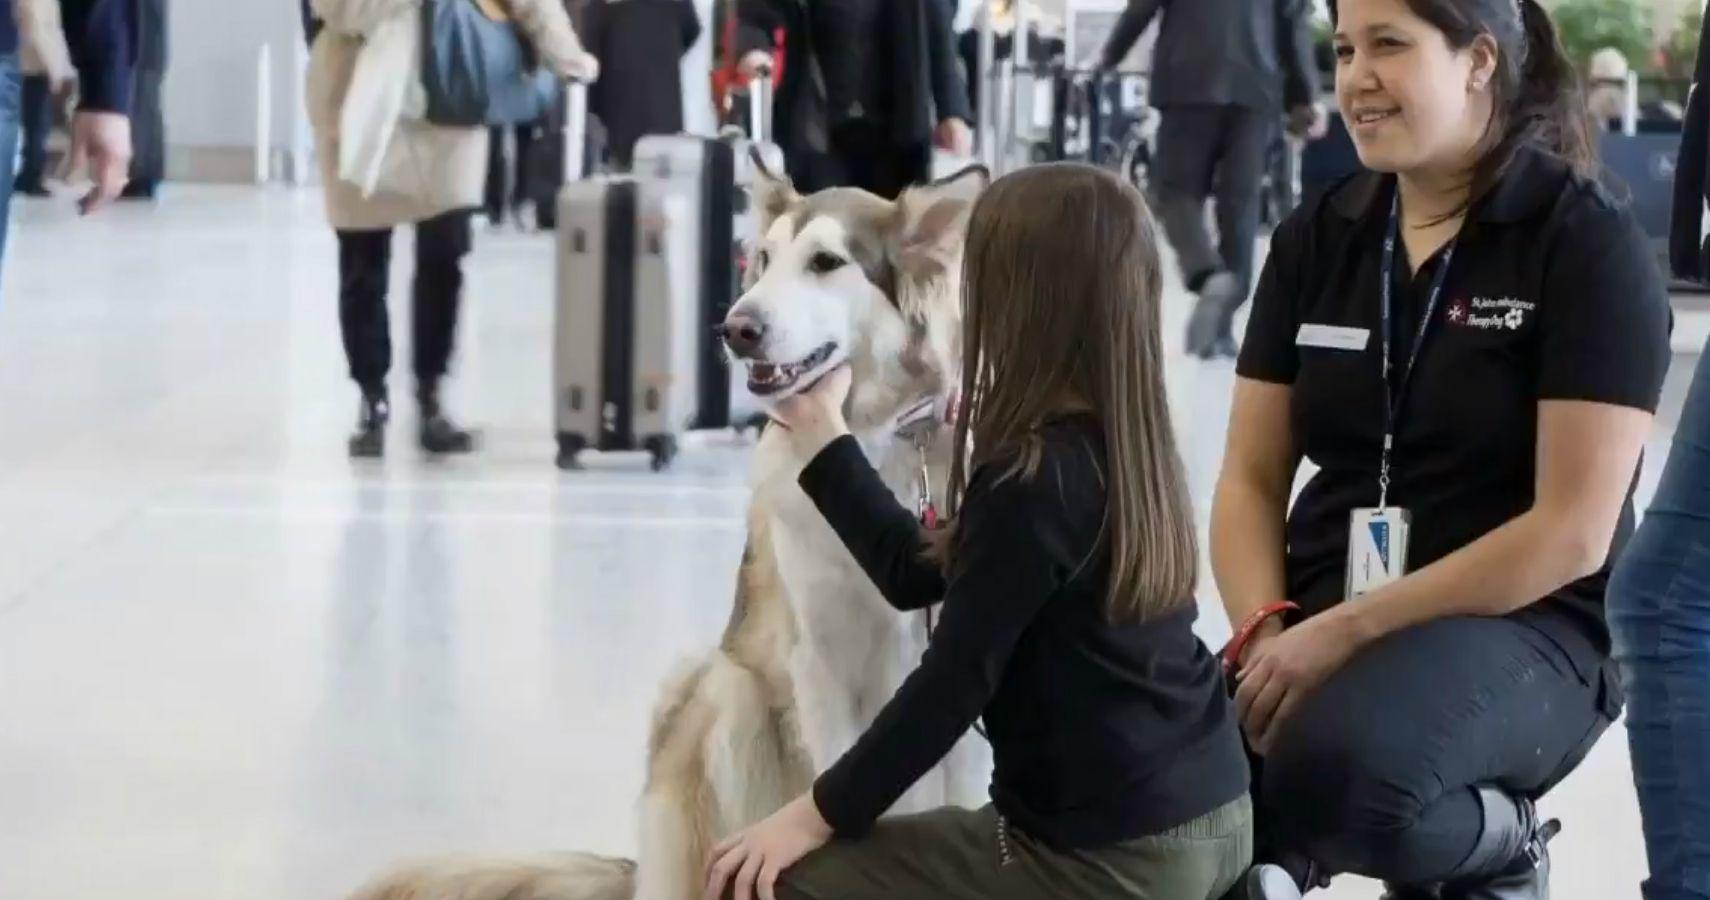 Aeroporto de Toronto contratou 15 cães para aliviar o stress dos passageiros